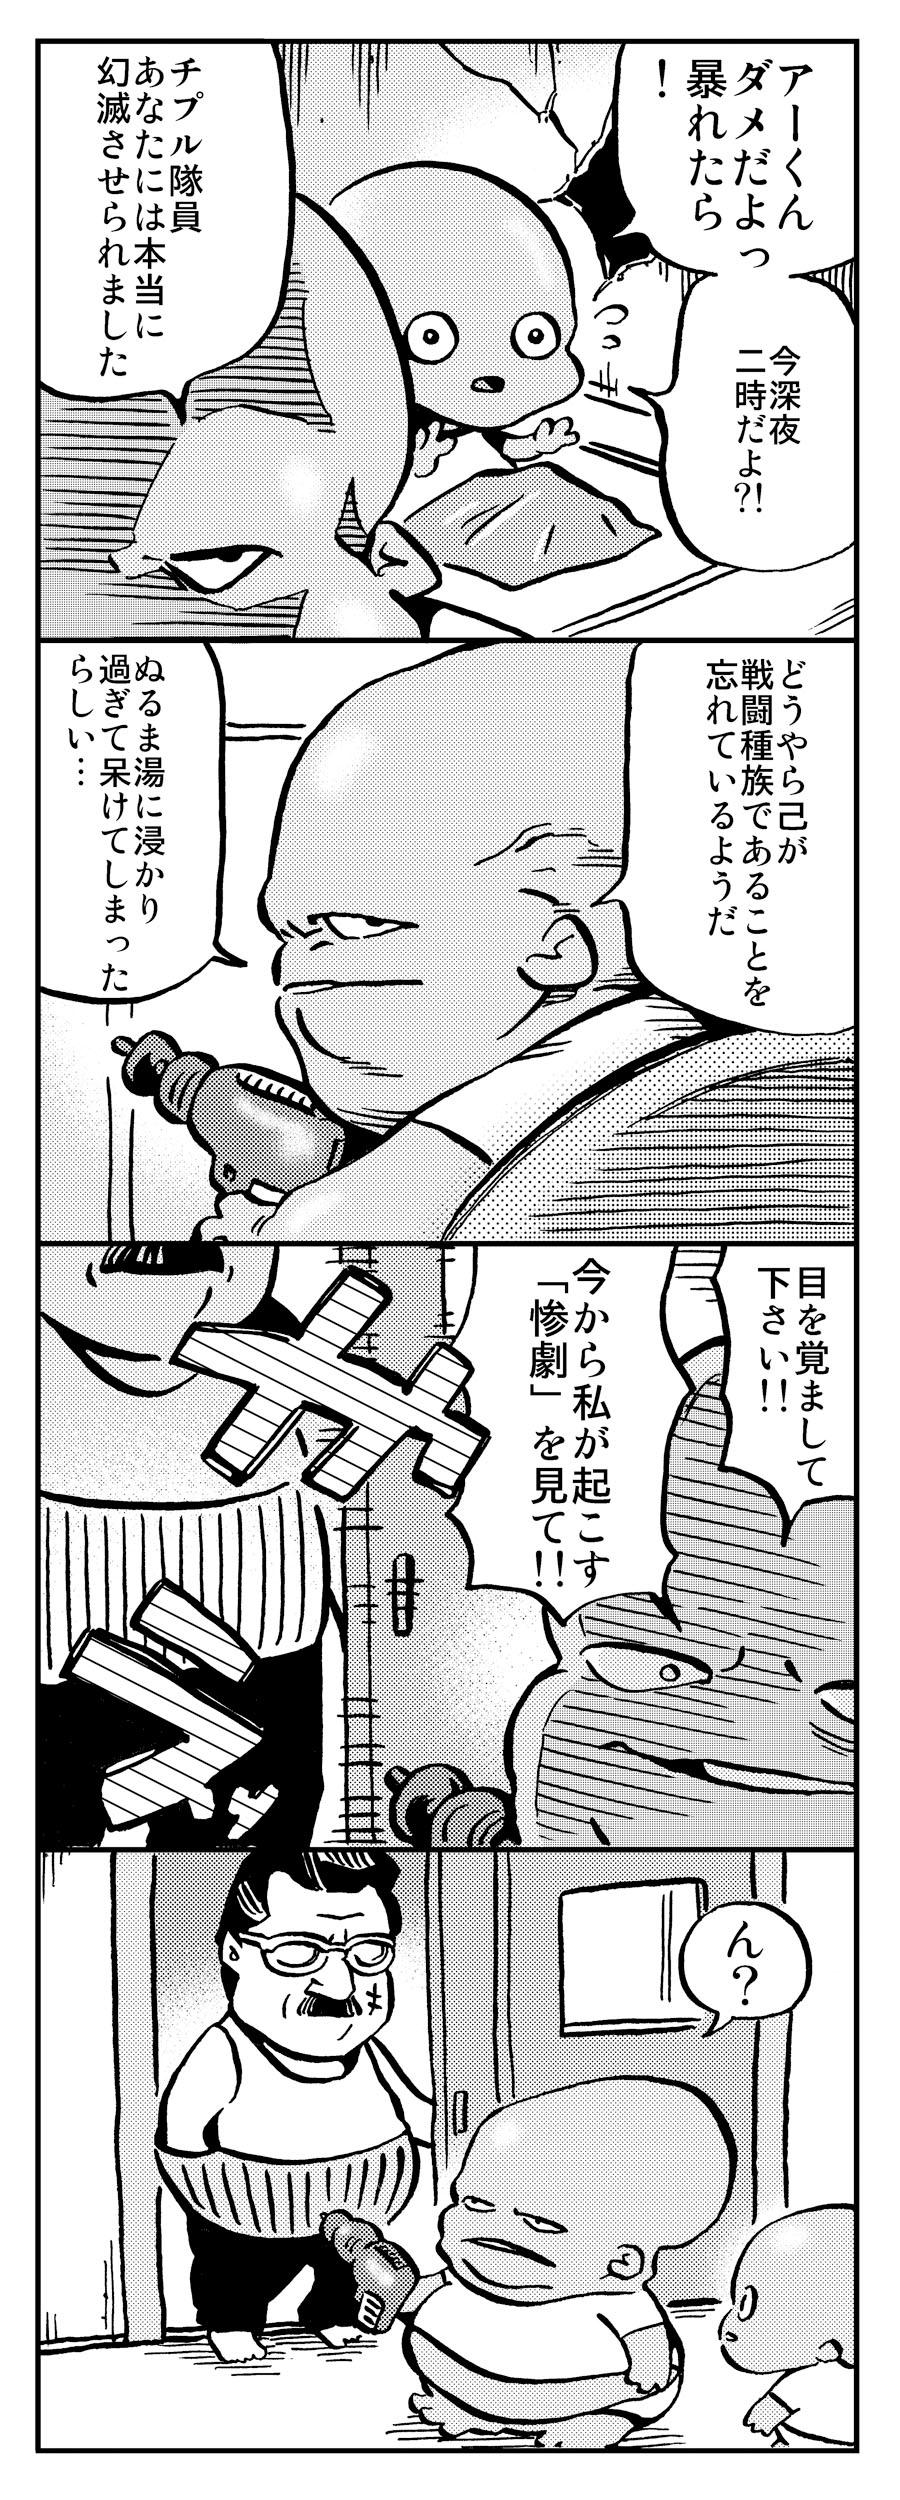 hippseijin_manga_02_02